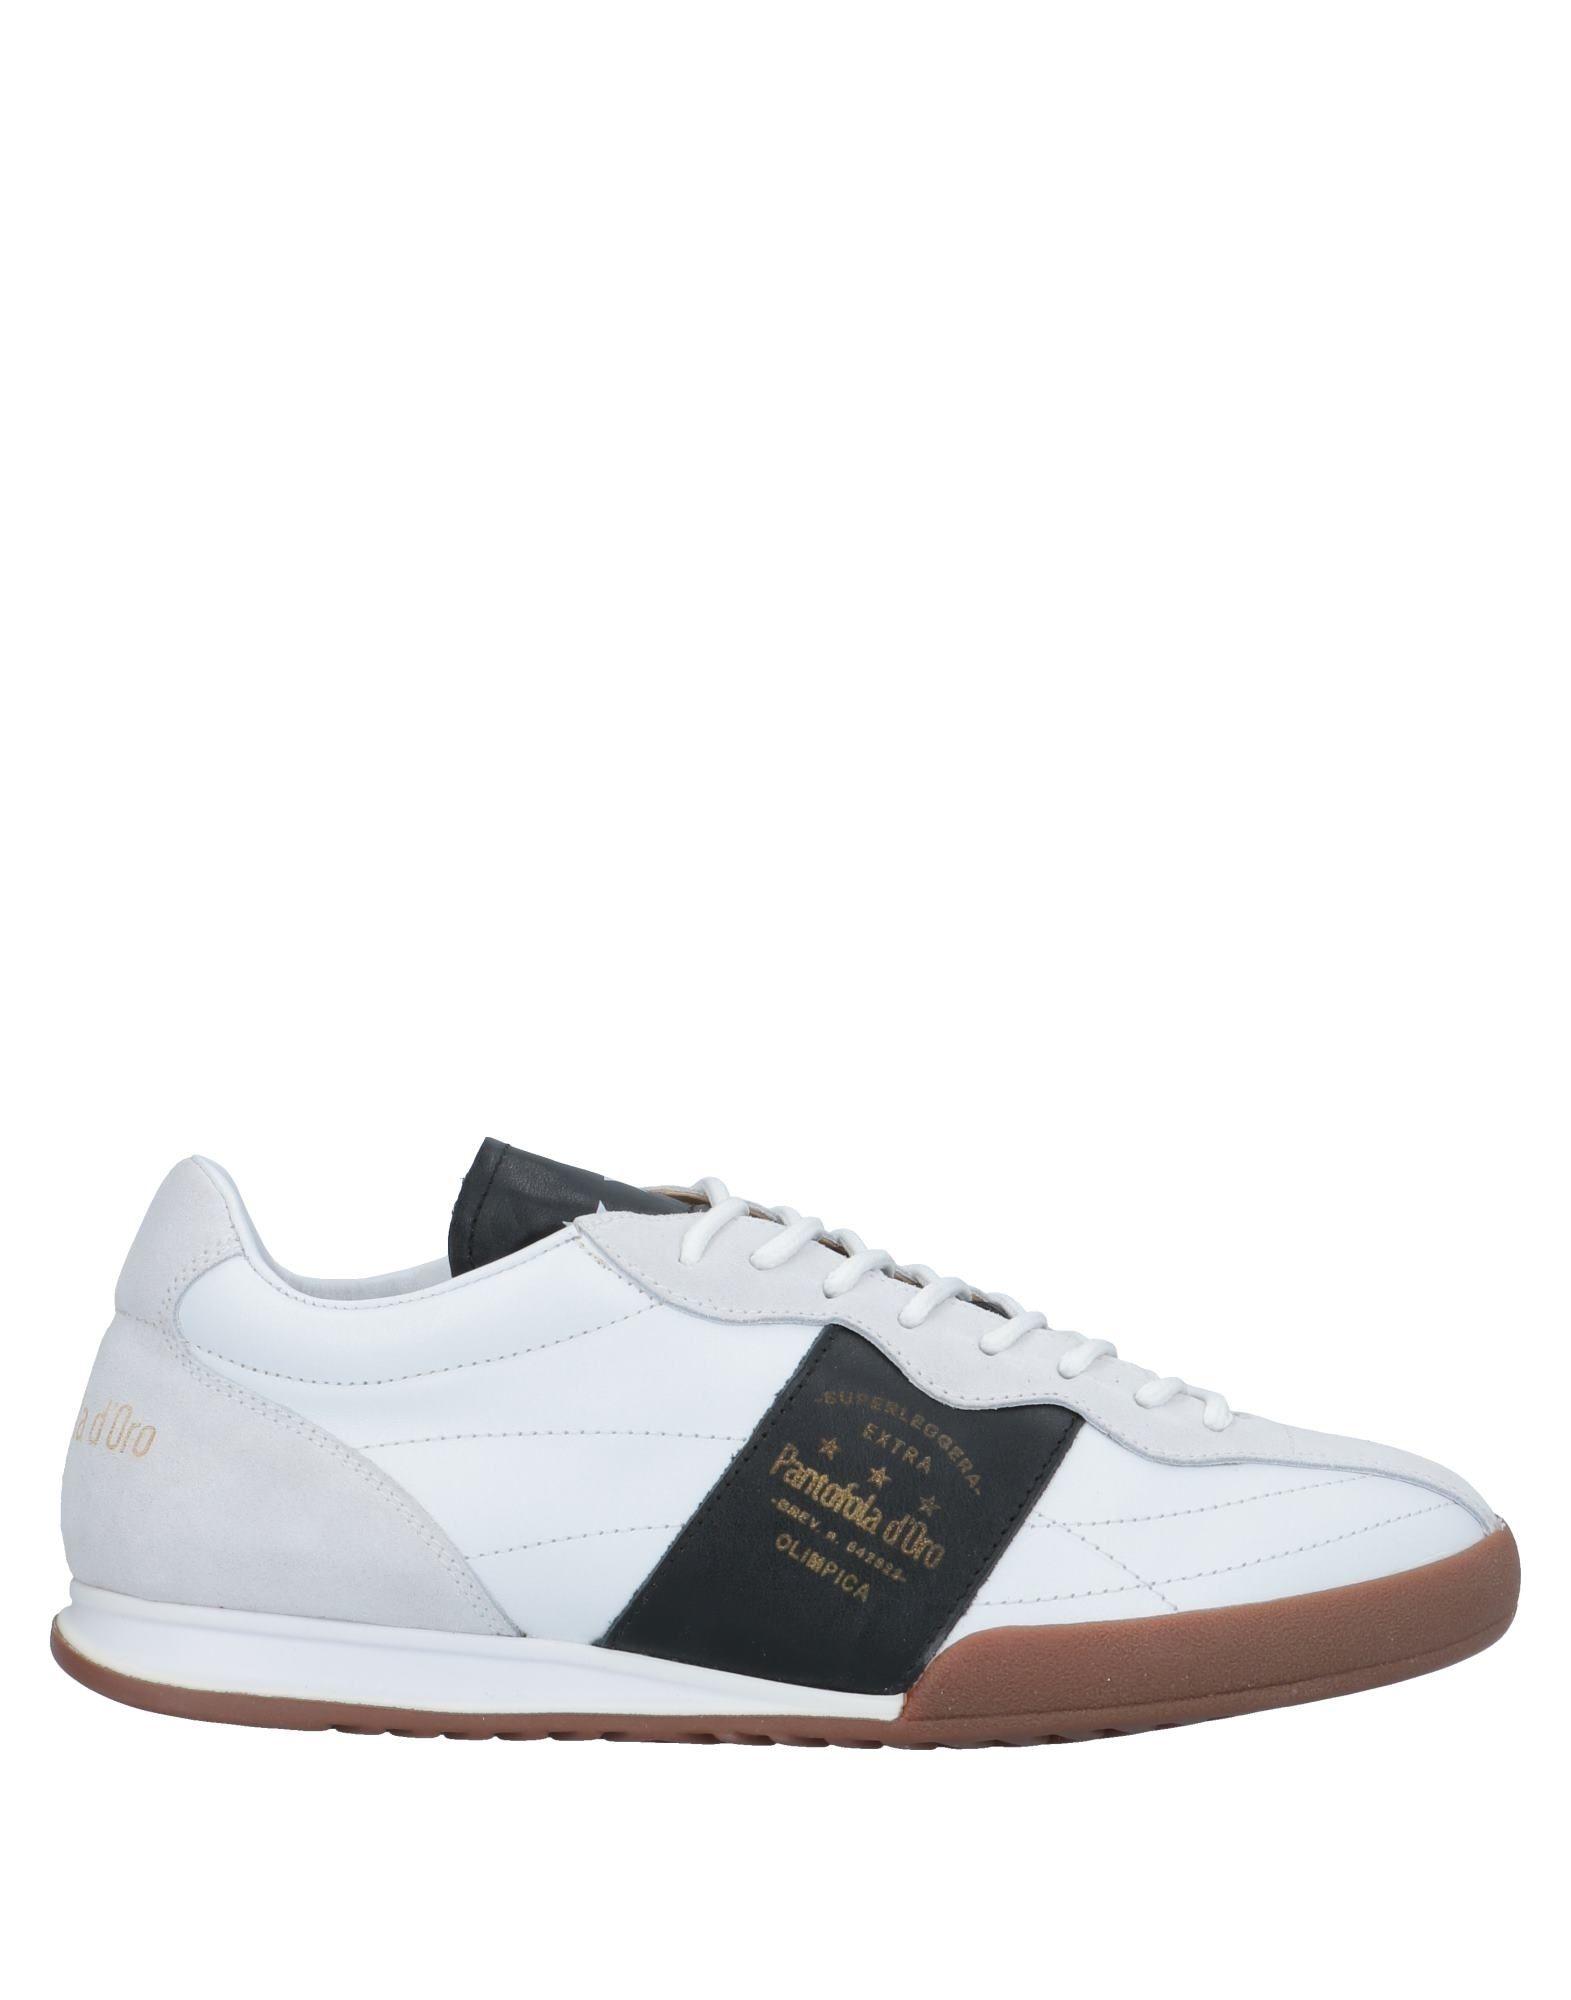 Turnschuhe Pantofola D'Gold herren - 11690061XG